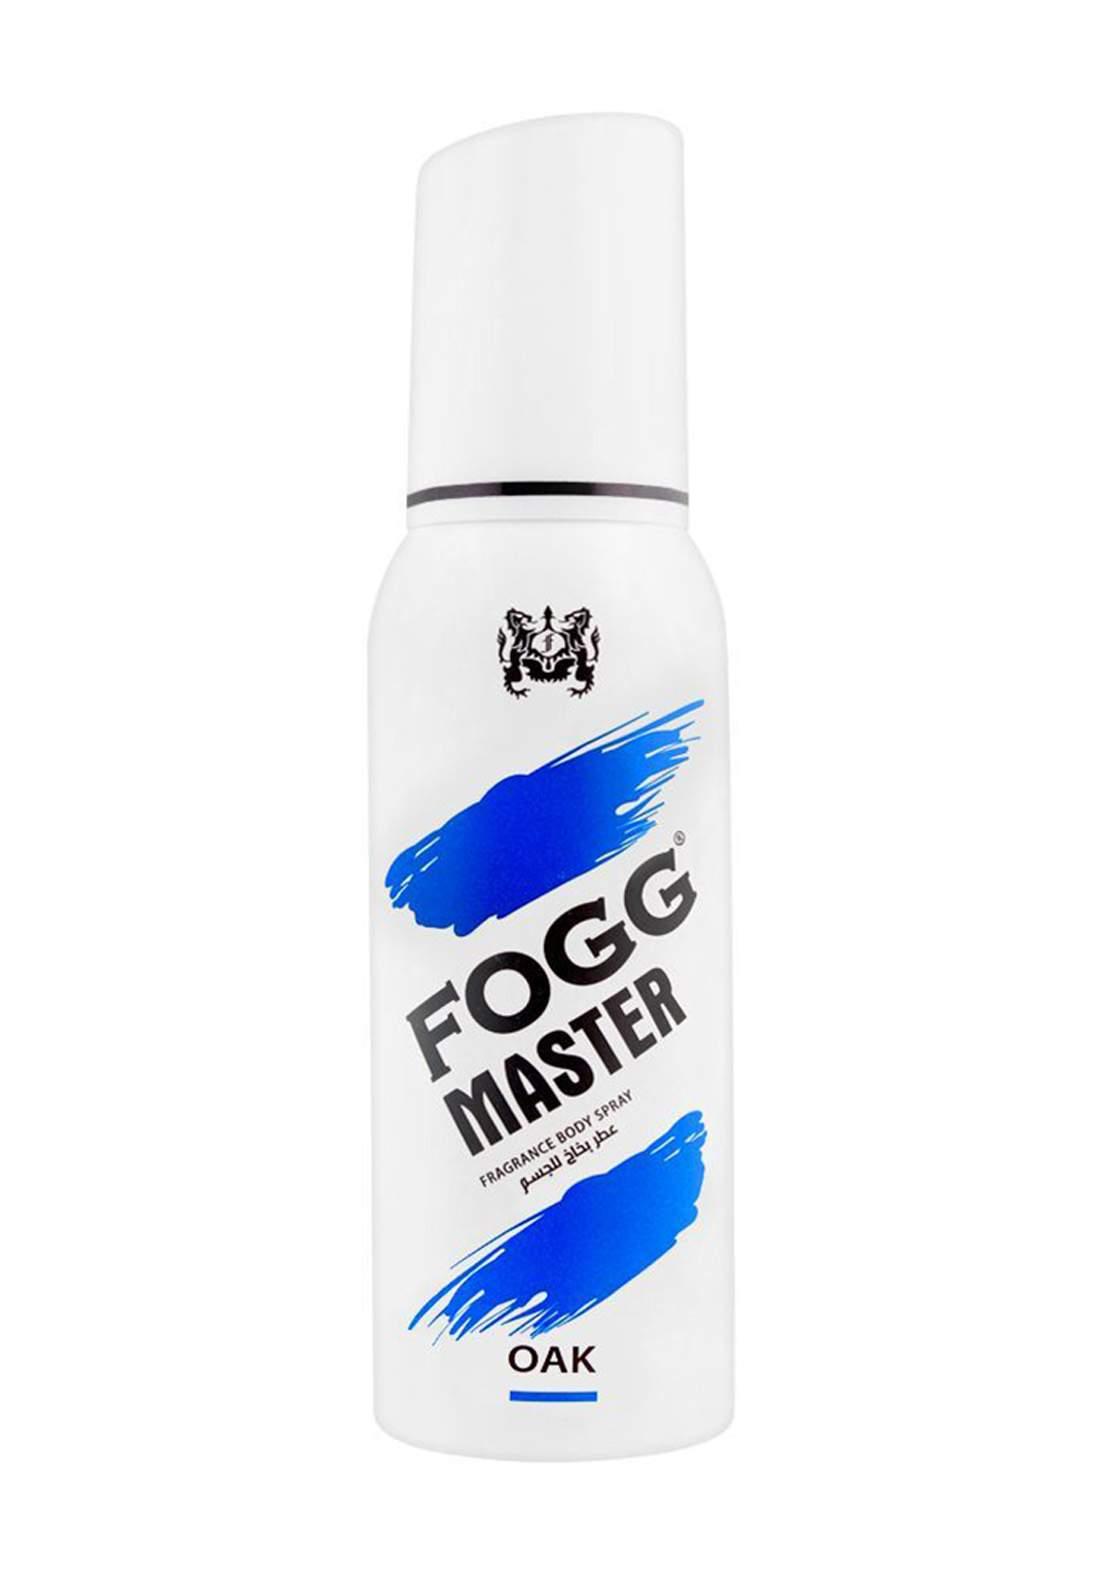 Fogg Master Oak Fragrance Body Spray For Men 120ml معطر جسم رجالي